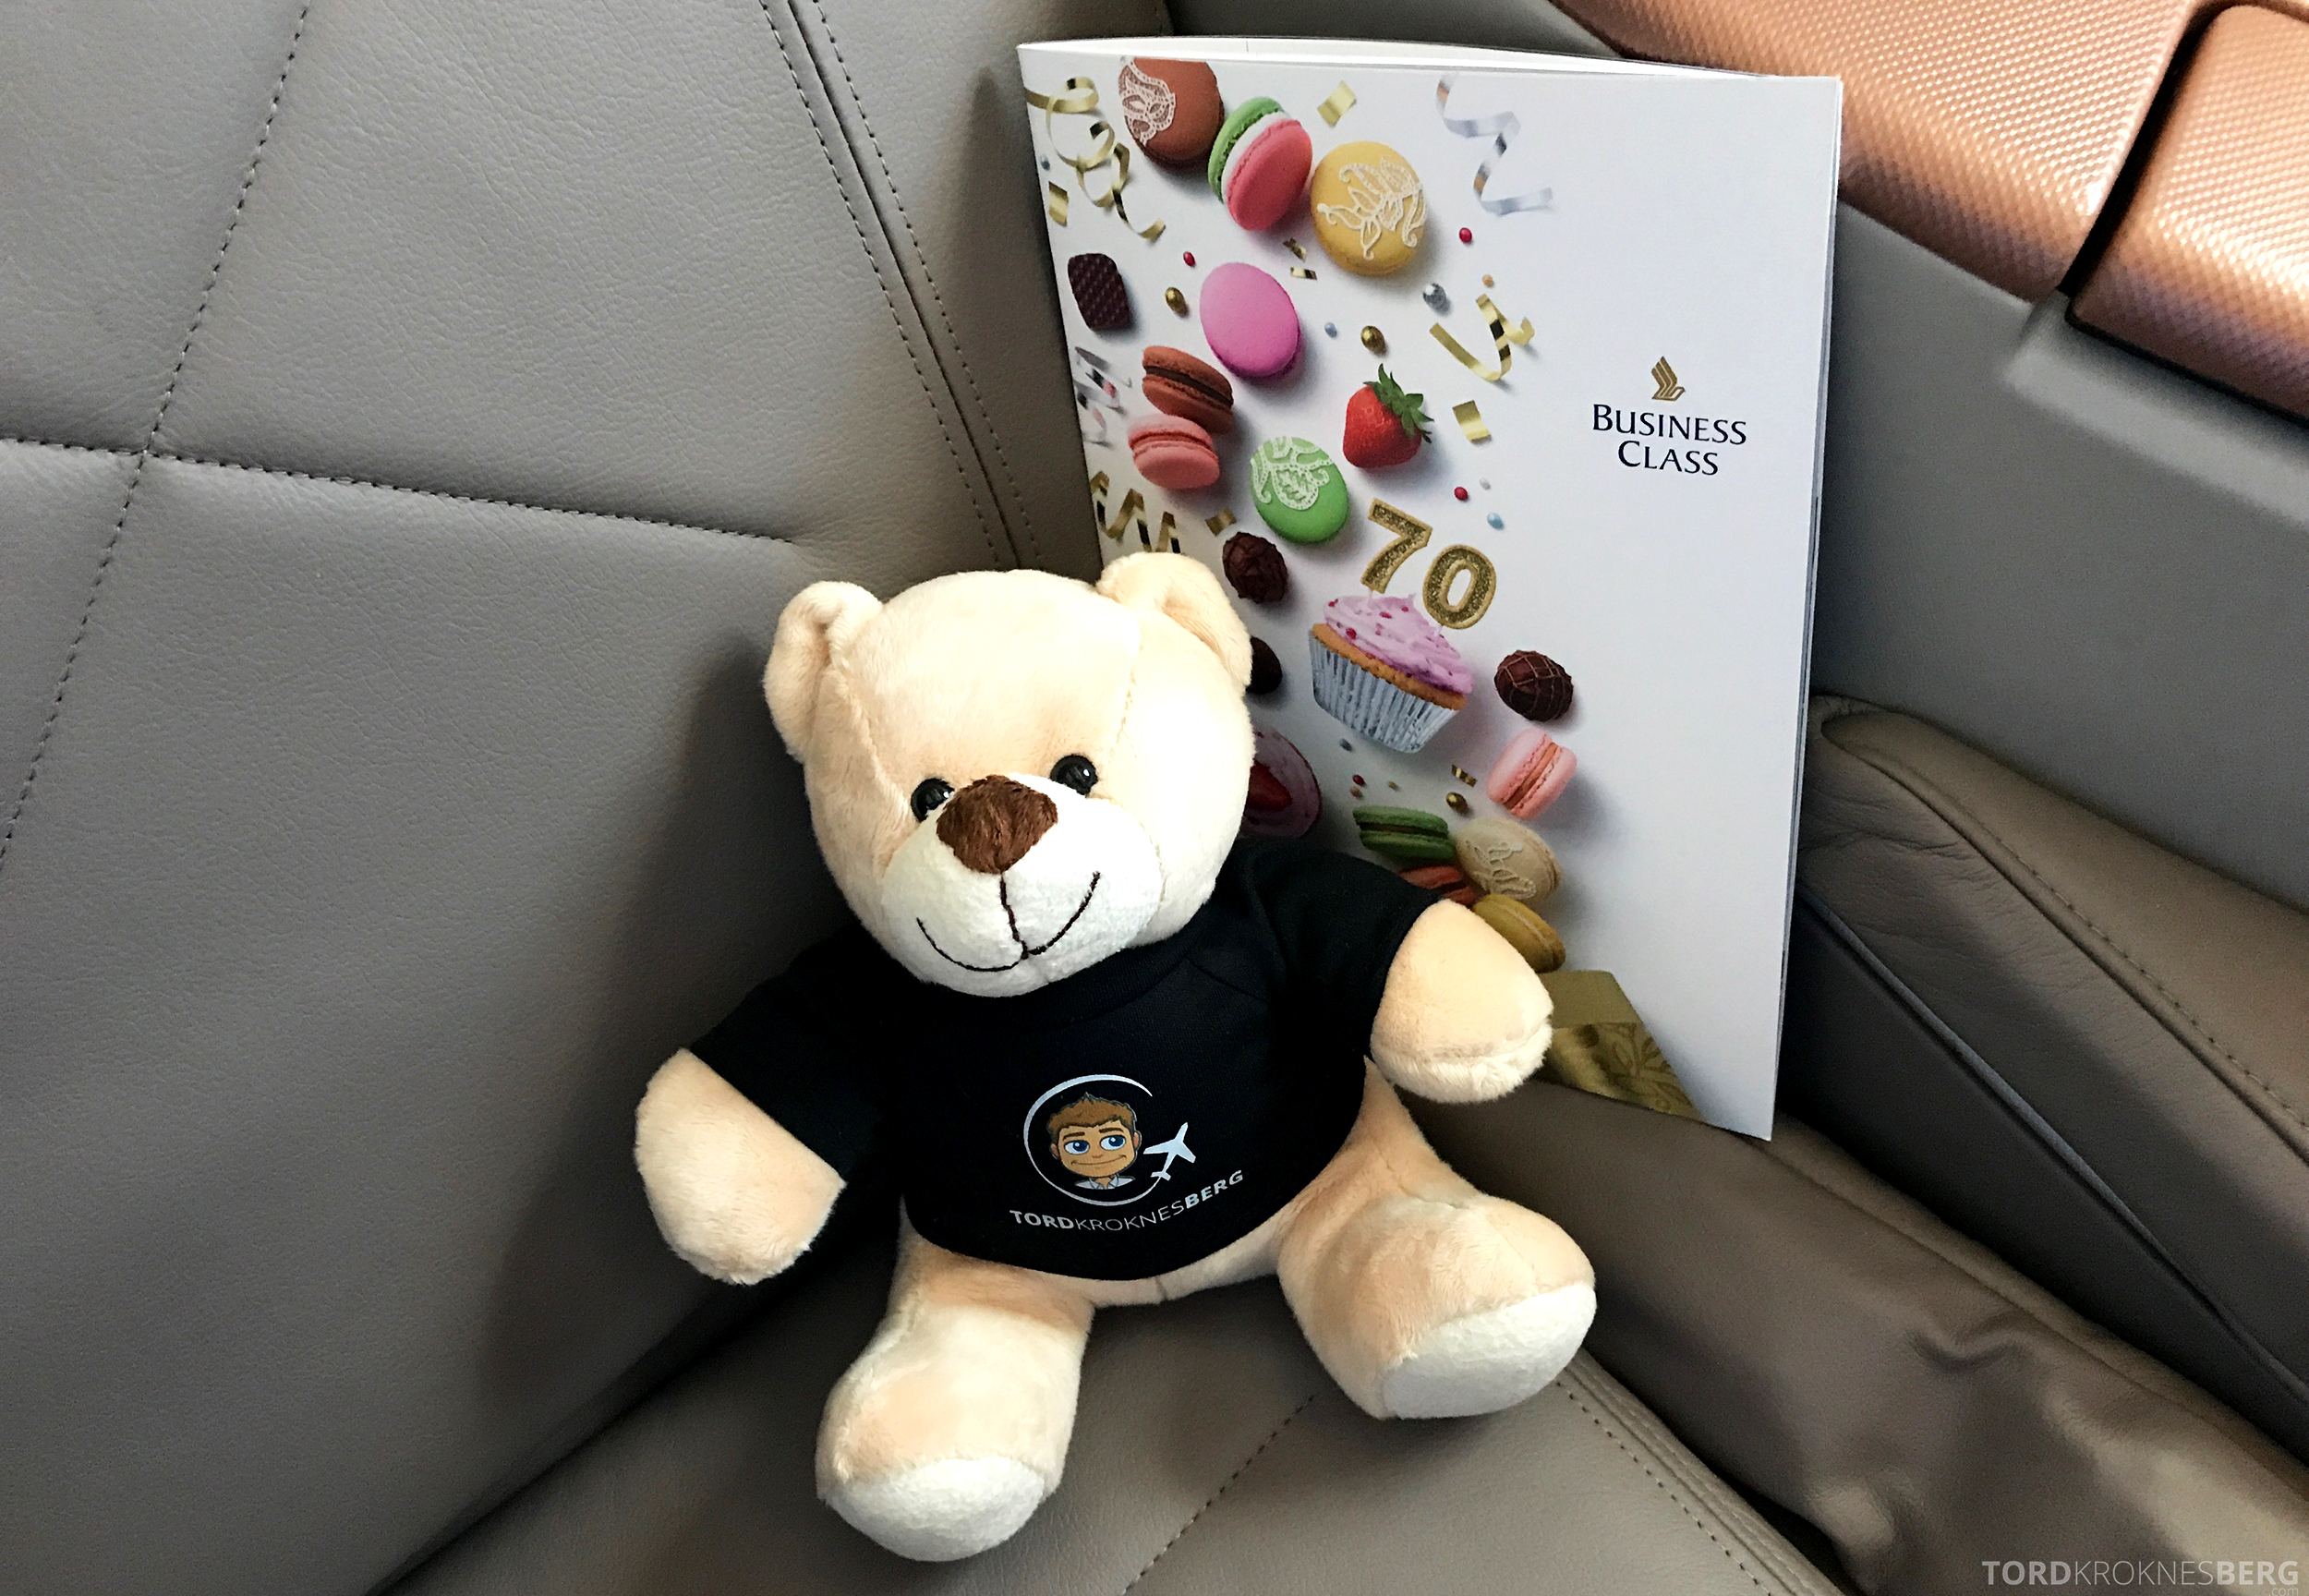 Singapore Airlines Business Class Moskva Singapore reisefølget meny